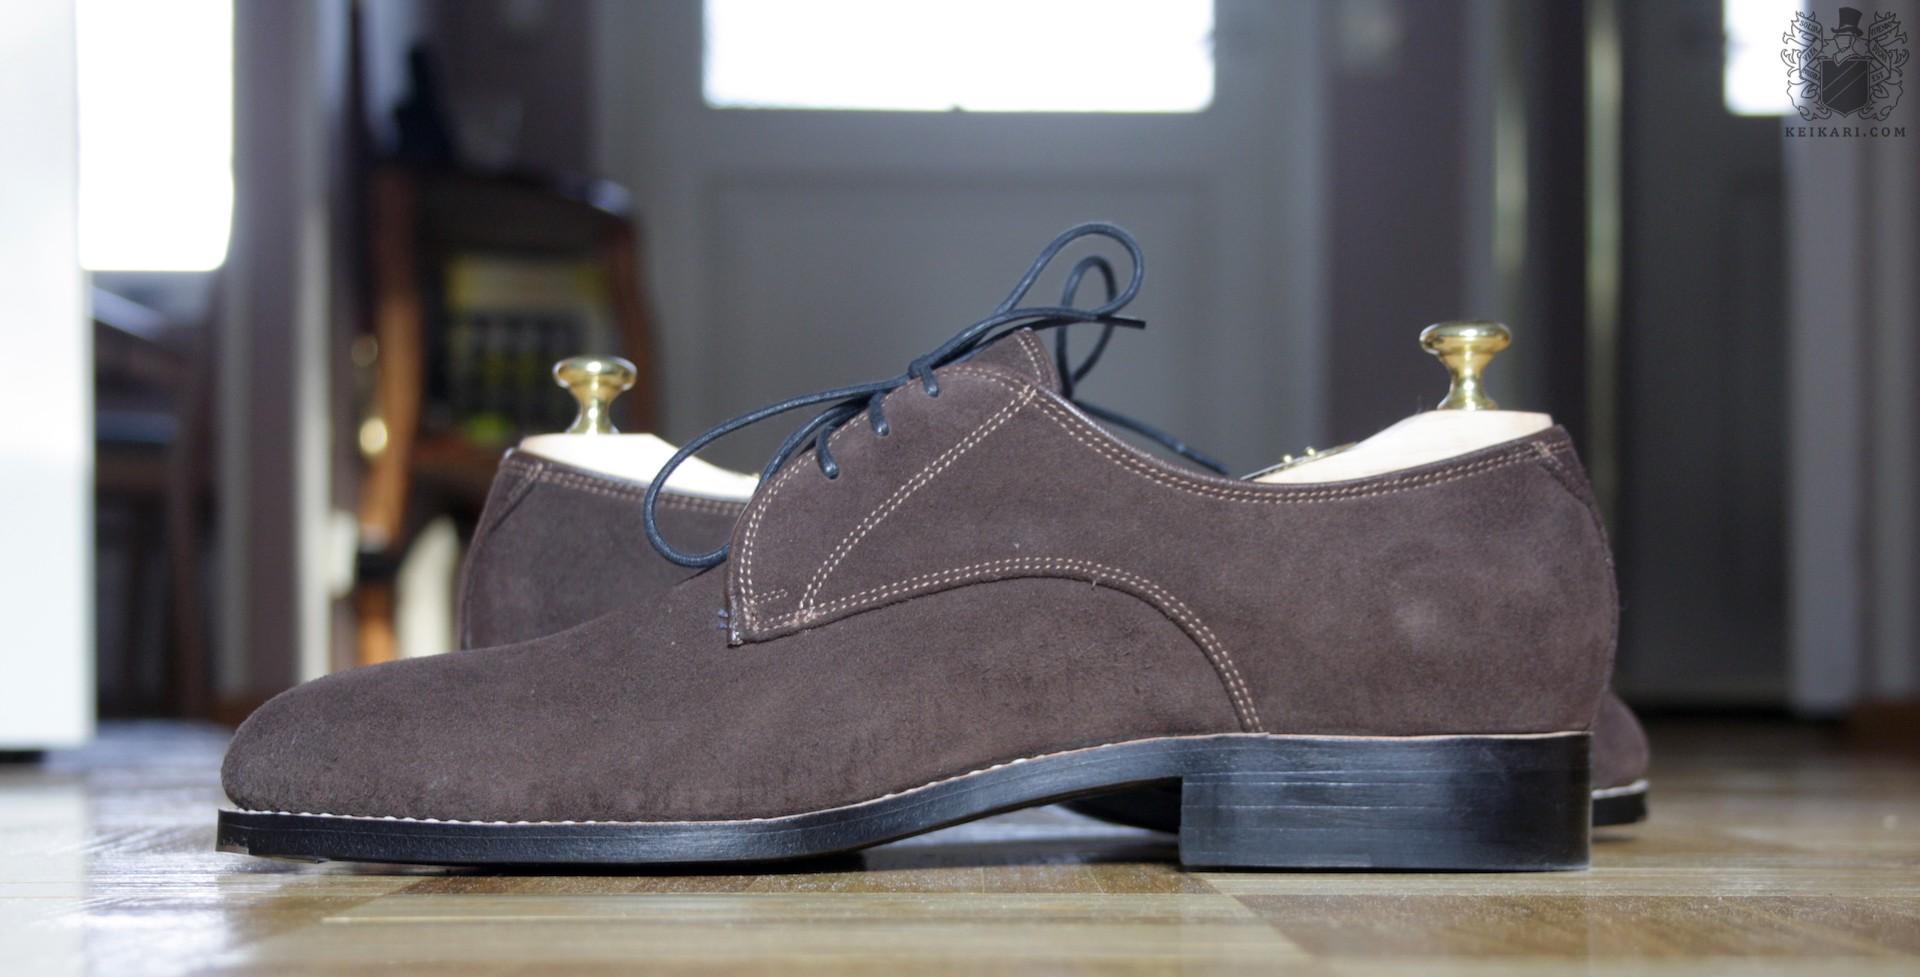 Anatomy_of_Buday_shoes_at_Keikari_dot_com07.jpg